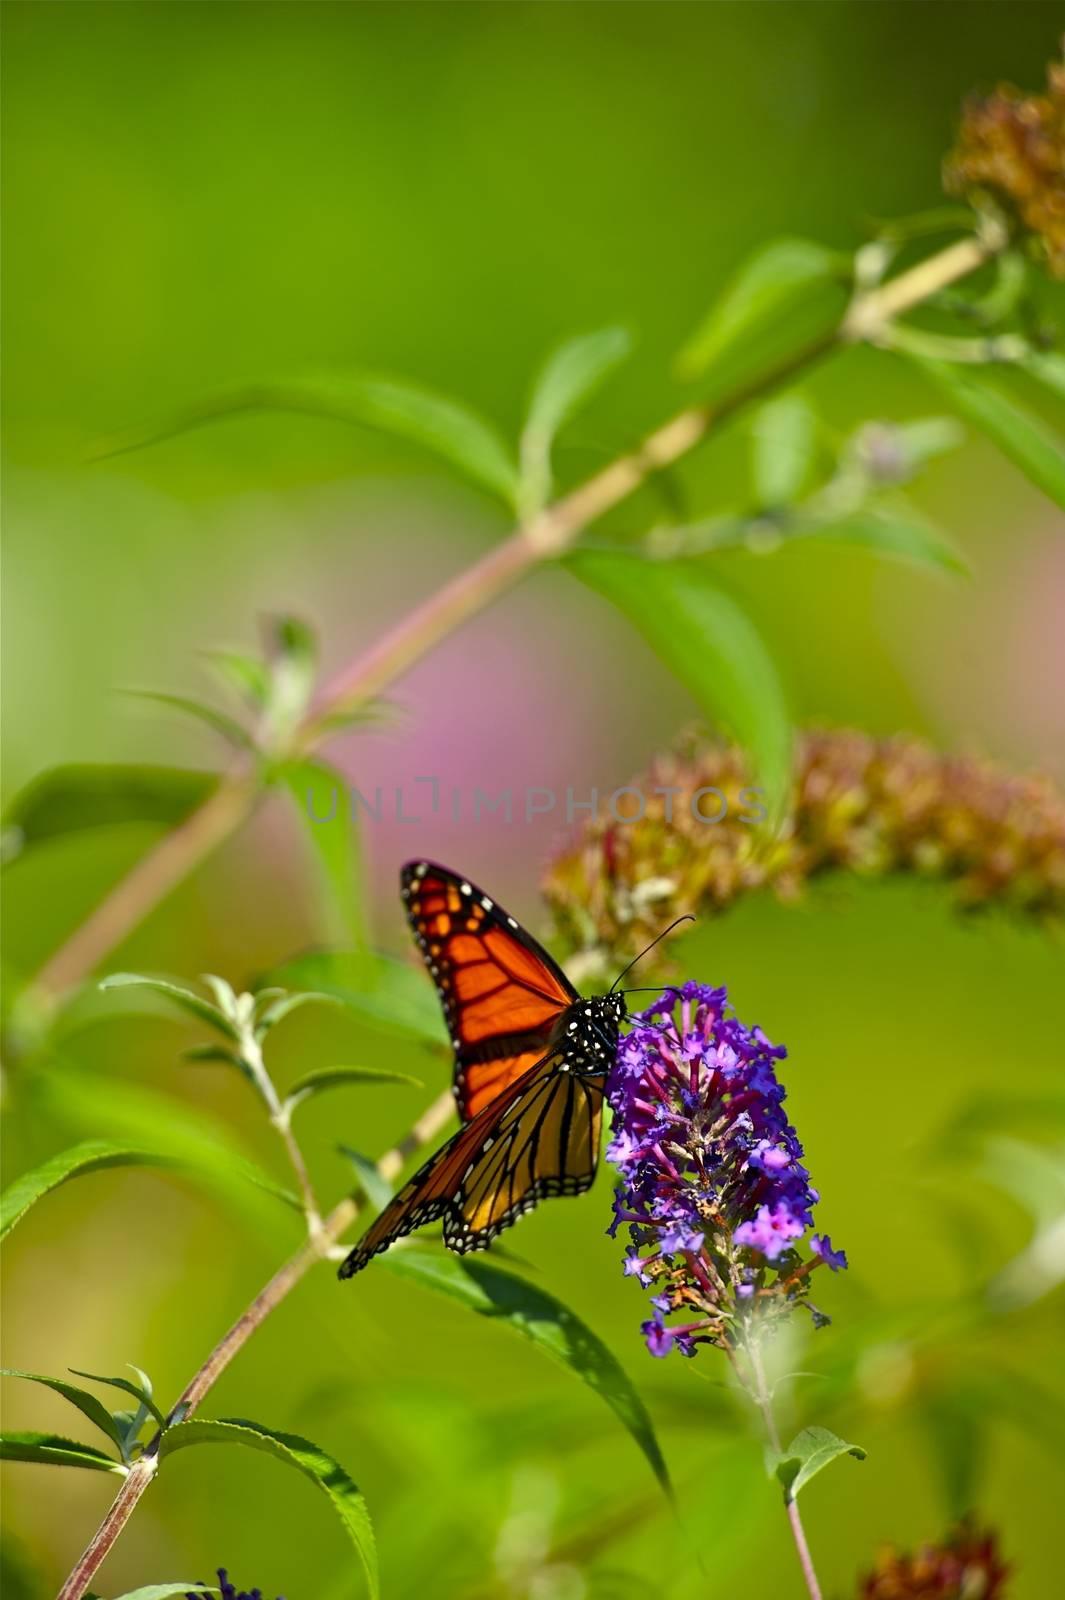 Summer Butterfly - Monarch Butterfly. Vertical Photo